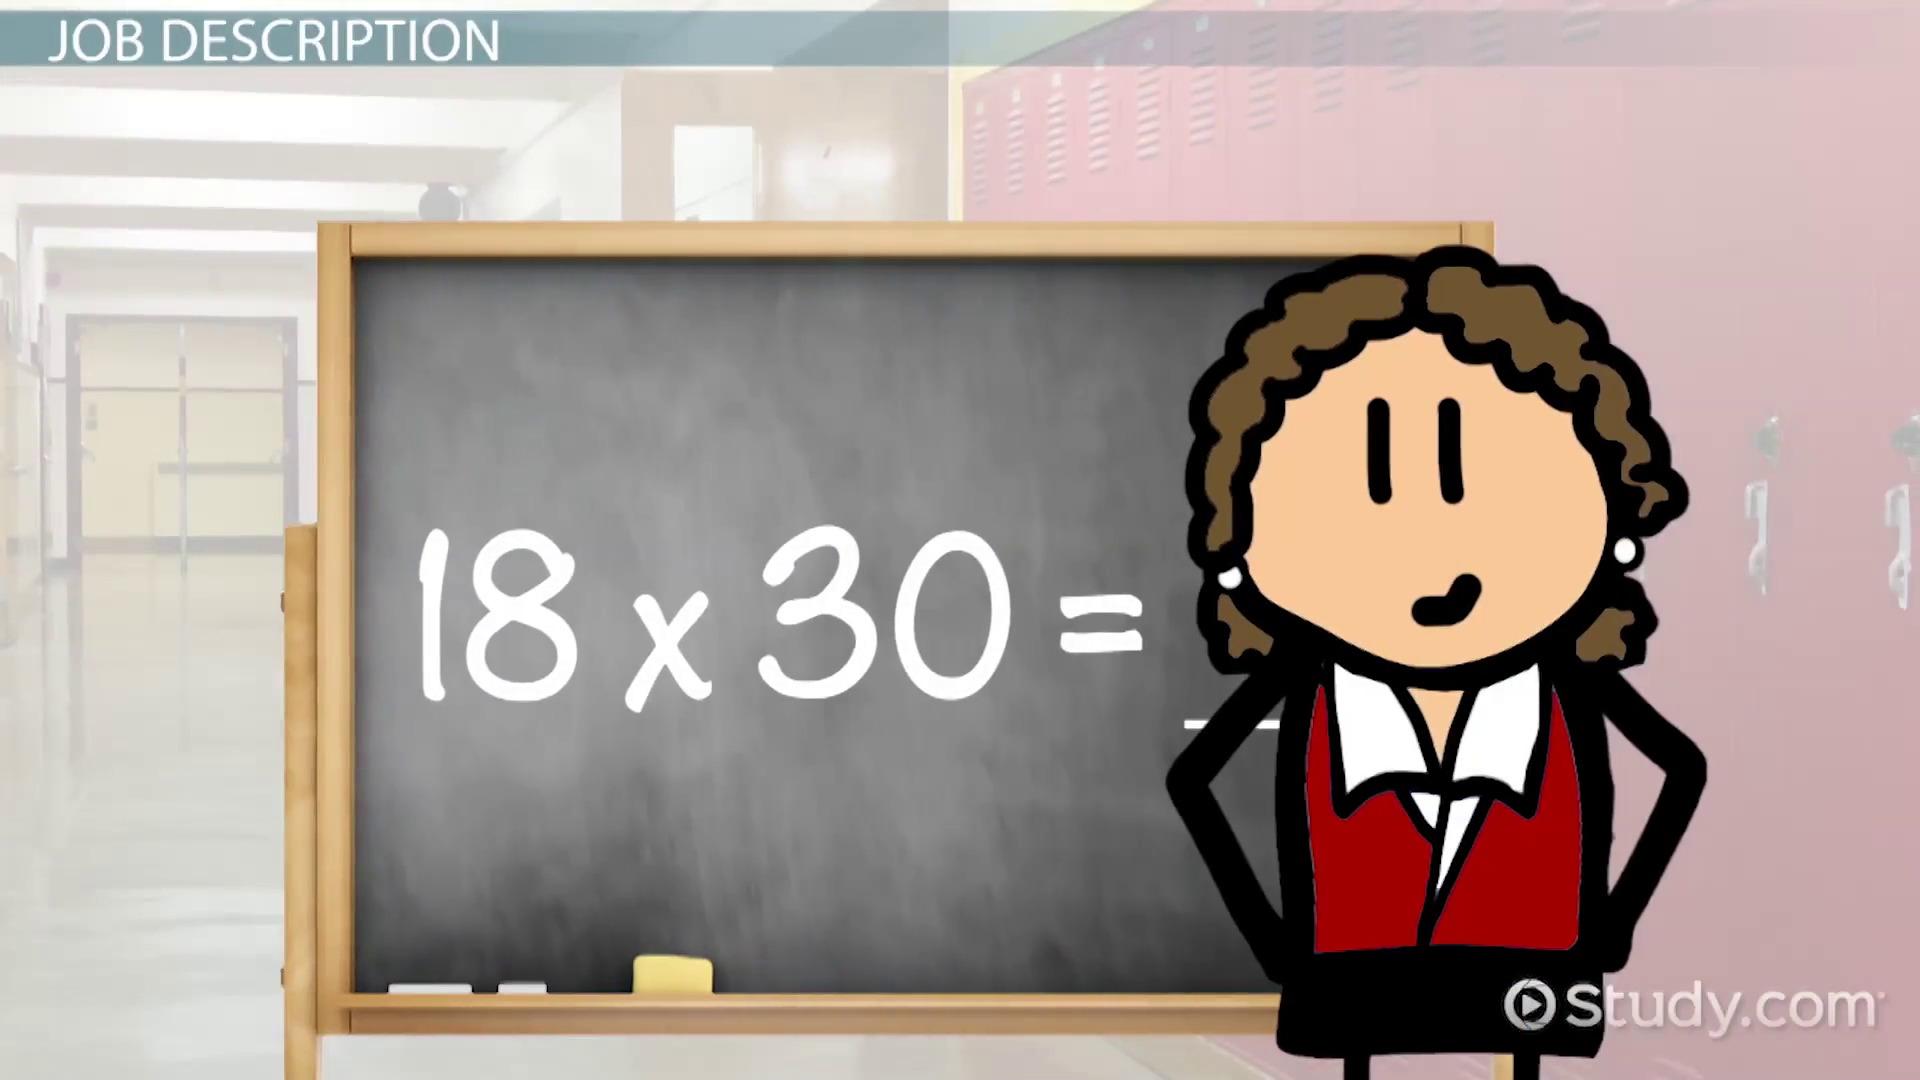 high school teacher job description duties and requirements